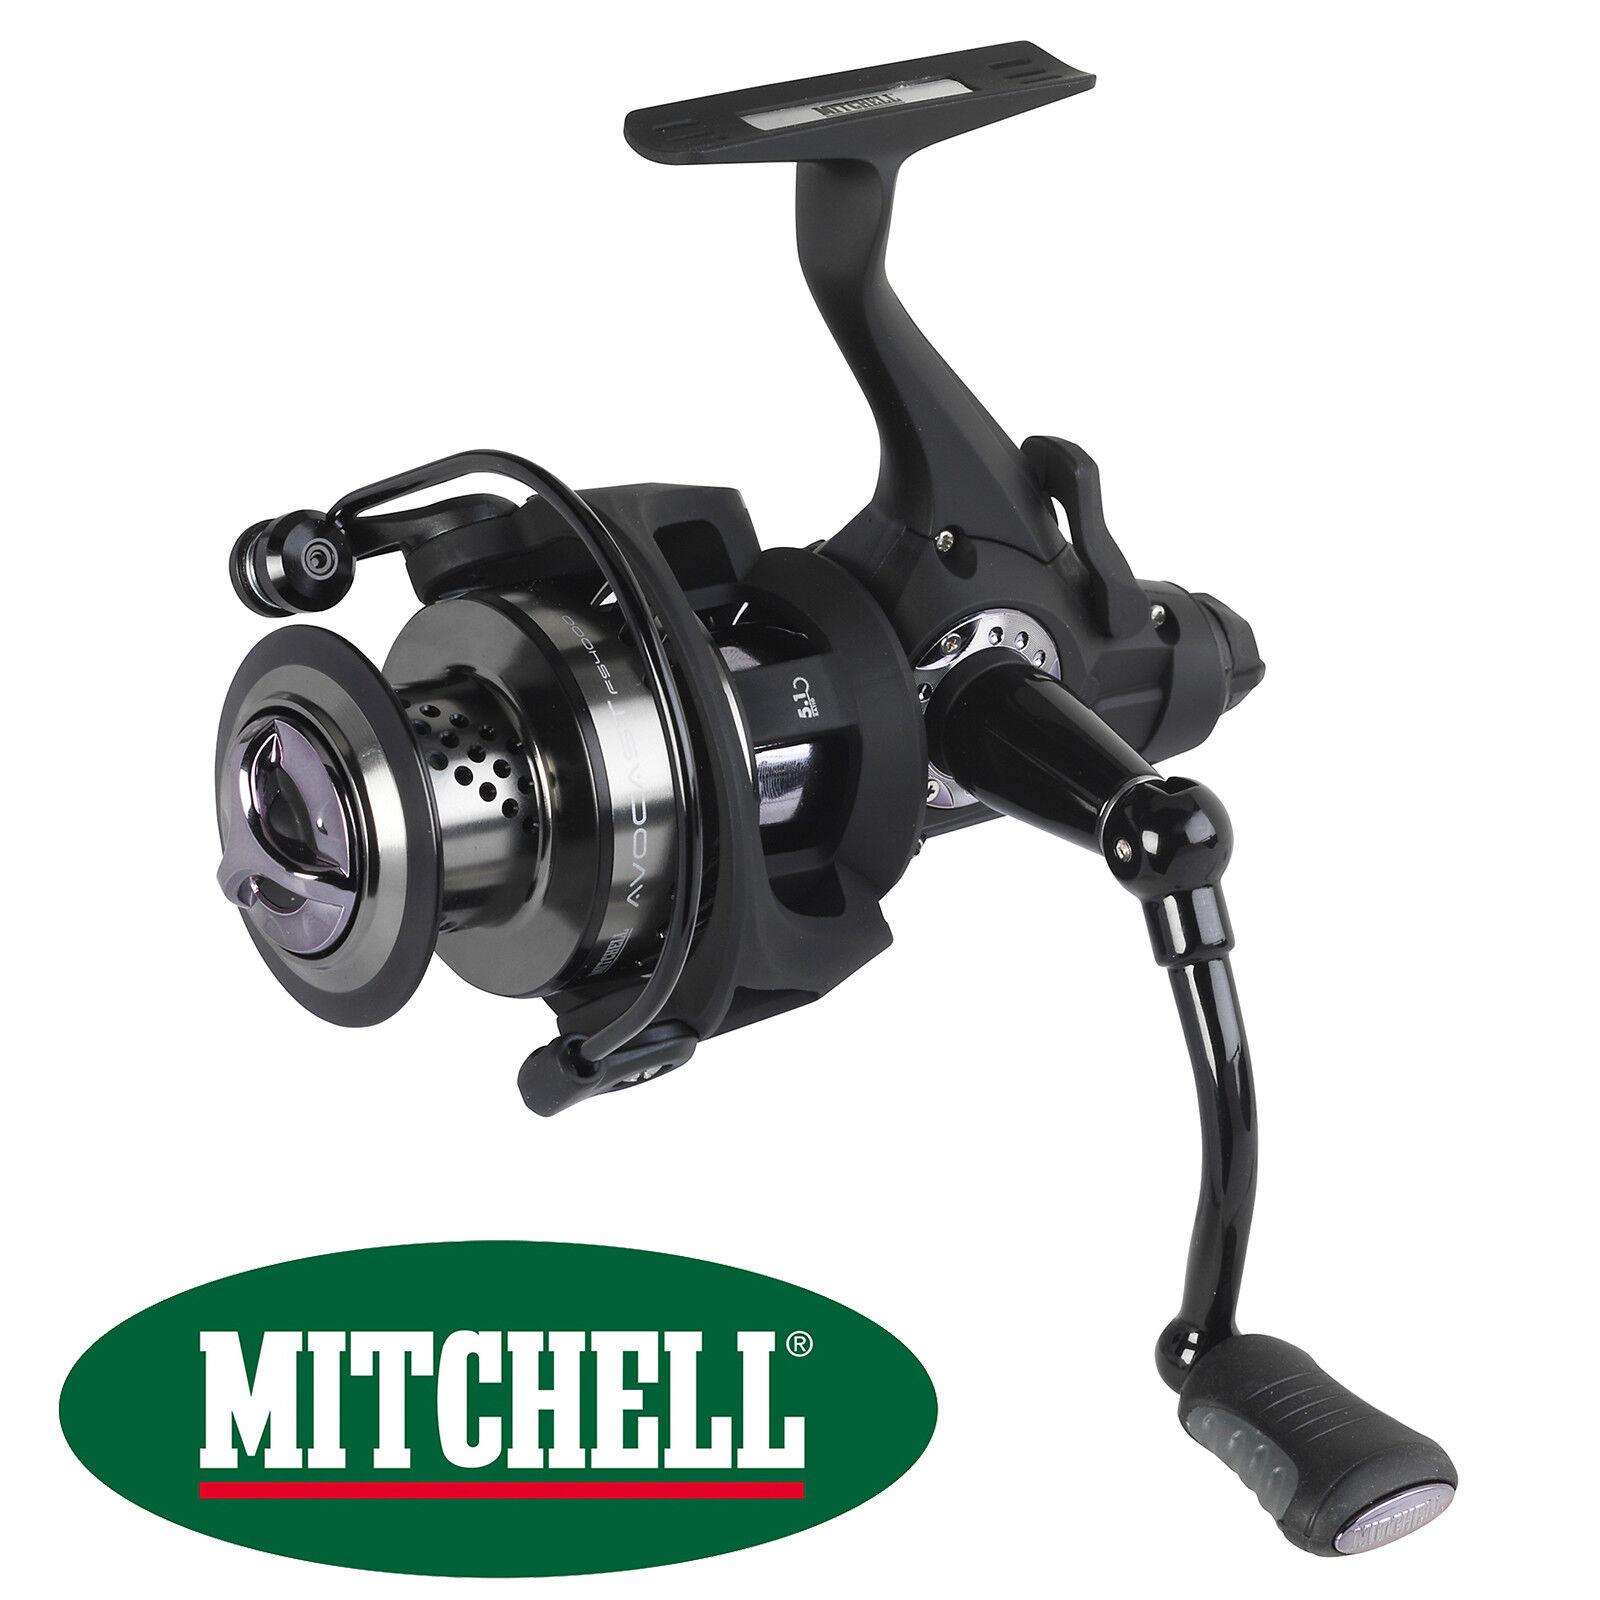 Mitchell  Avocast FS 4000 Free Runner Spinning Reel Rear Drag Carp Coarse Fishing  free shipping worldwide